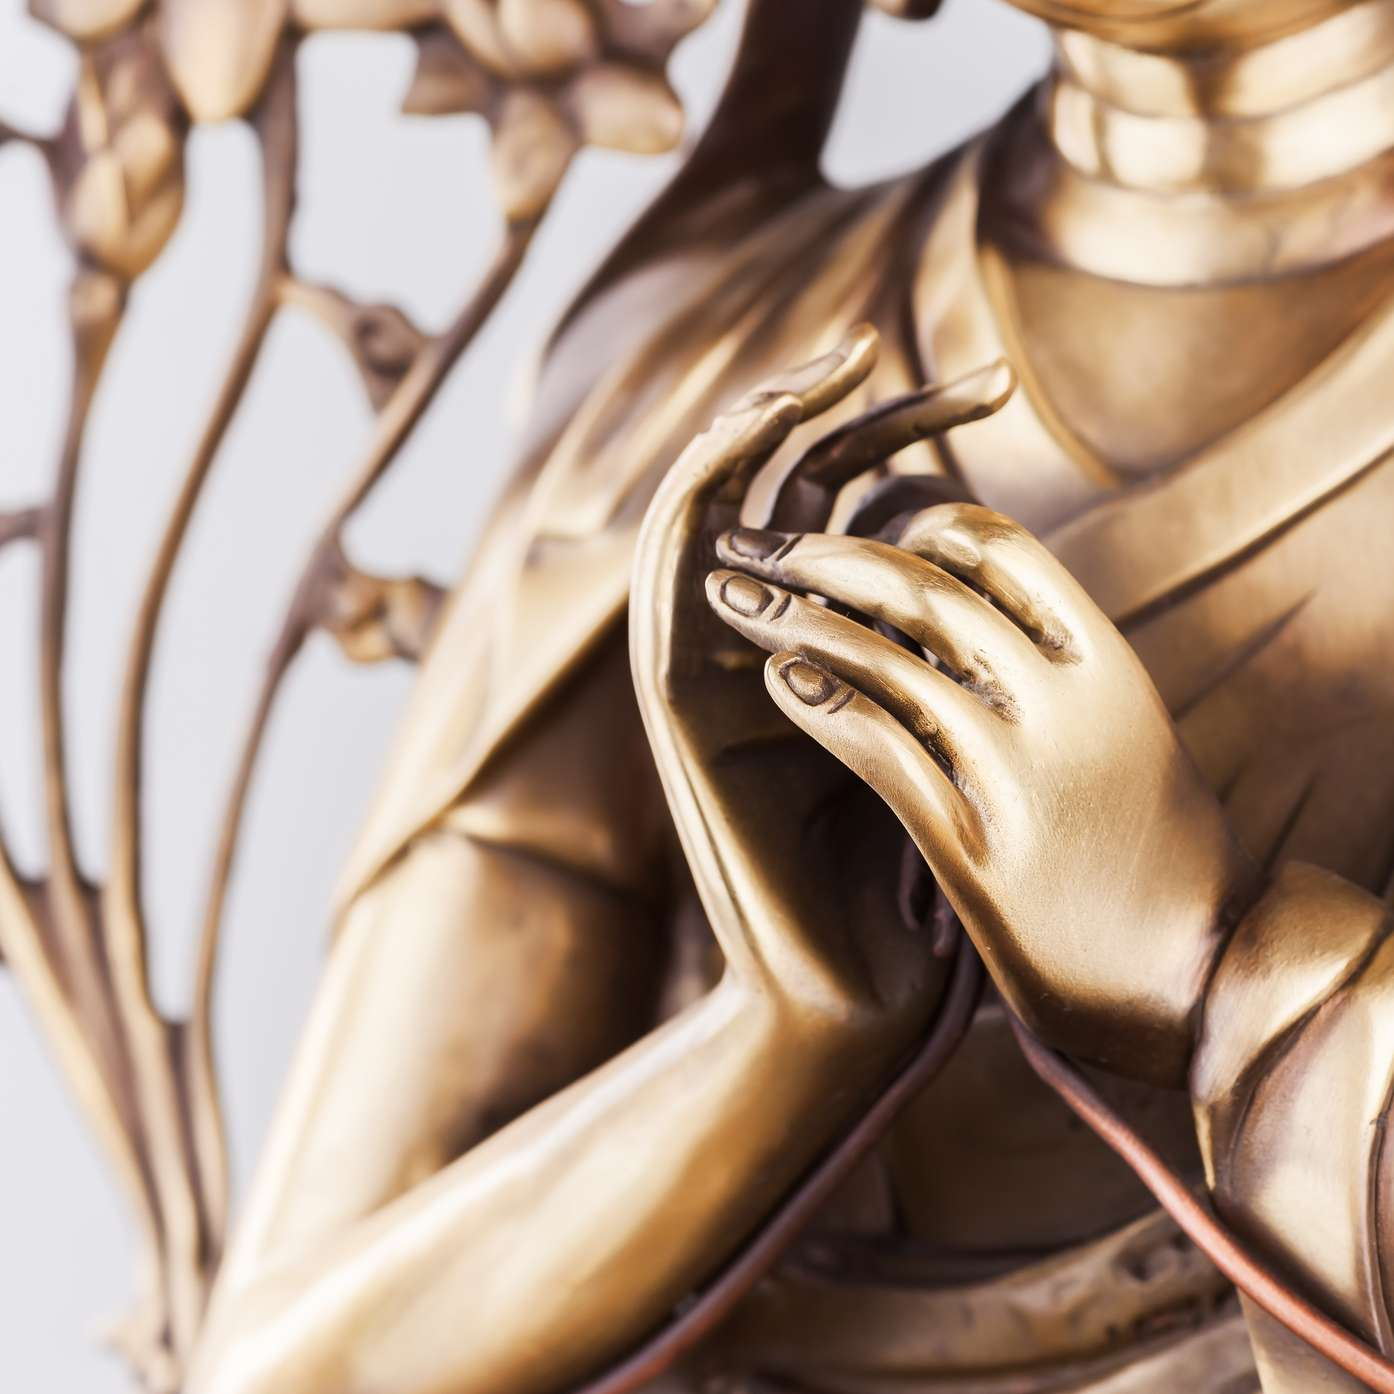 Bodkhisattva Avalokiteshvara. Arms in position Dkharmachakra mudra